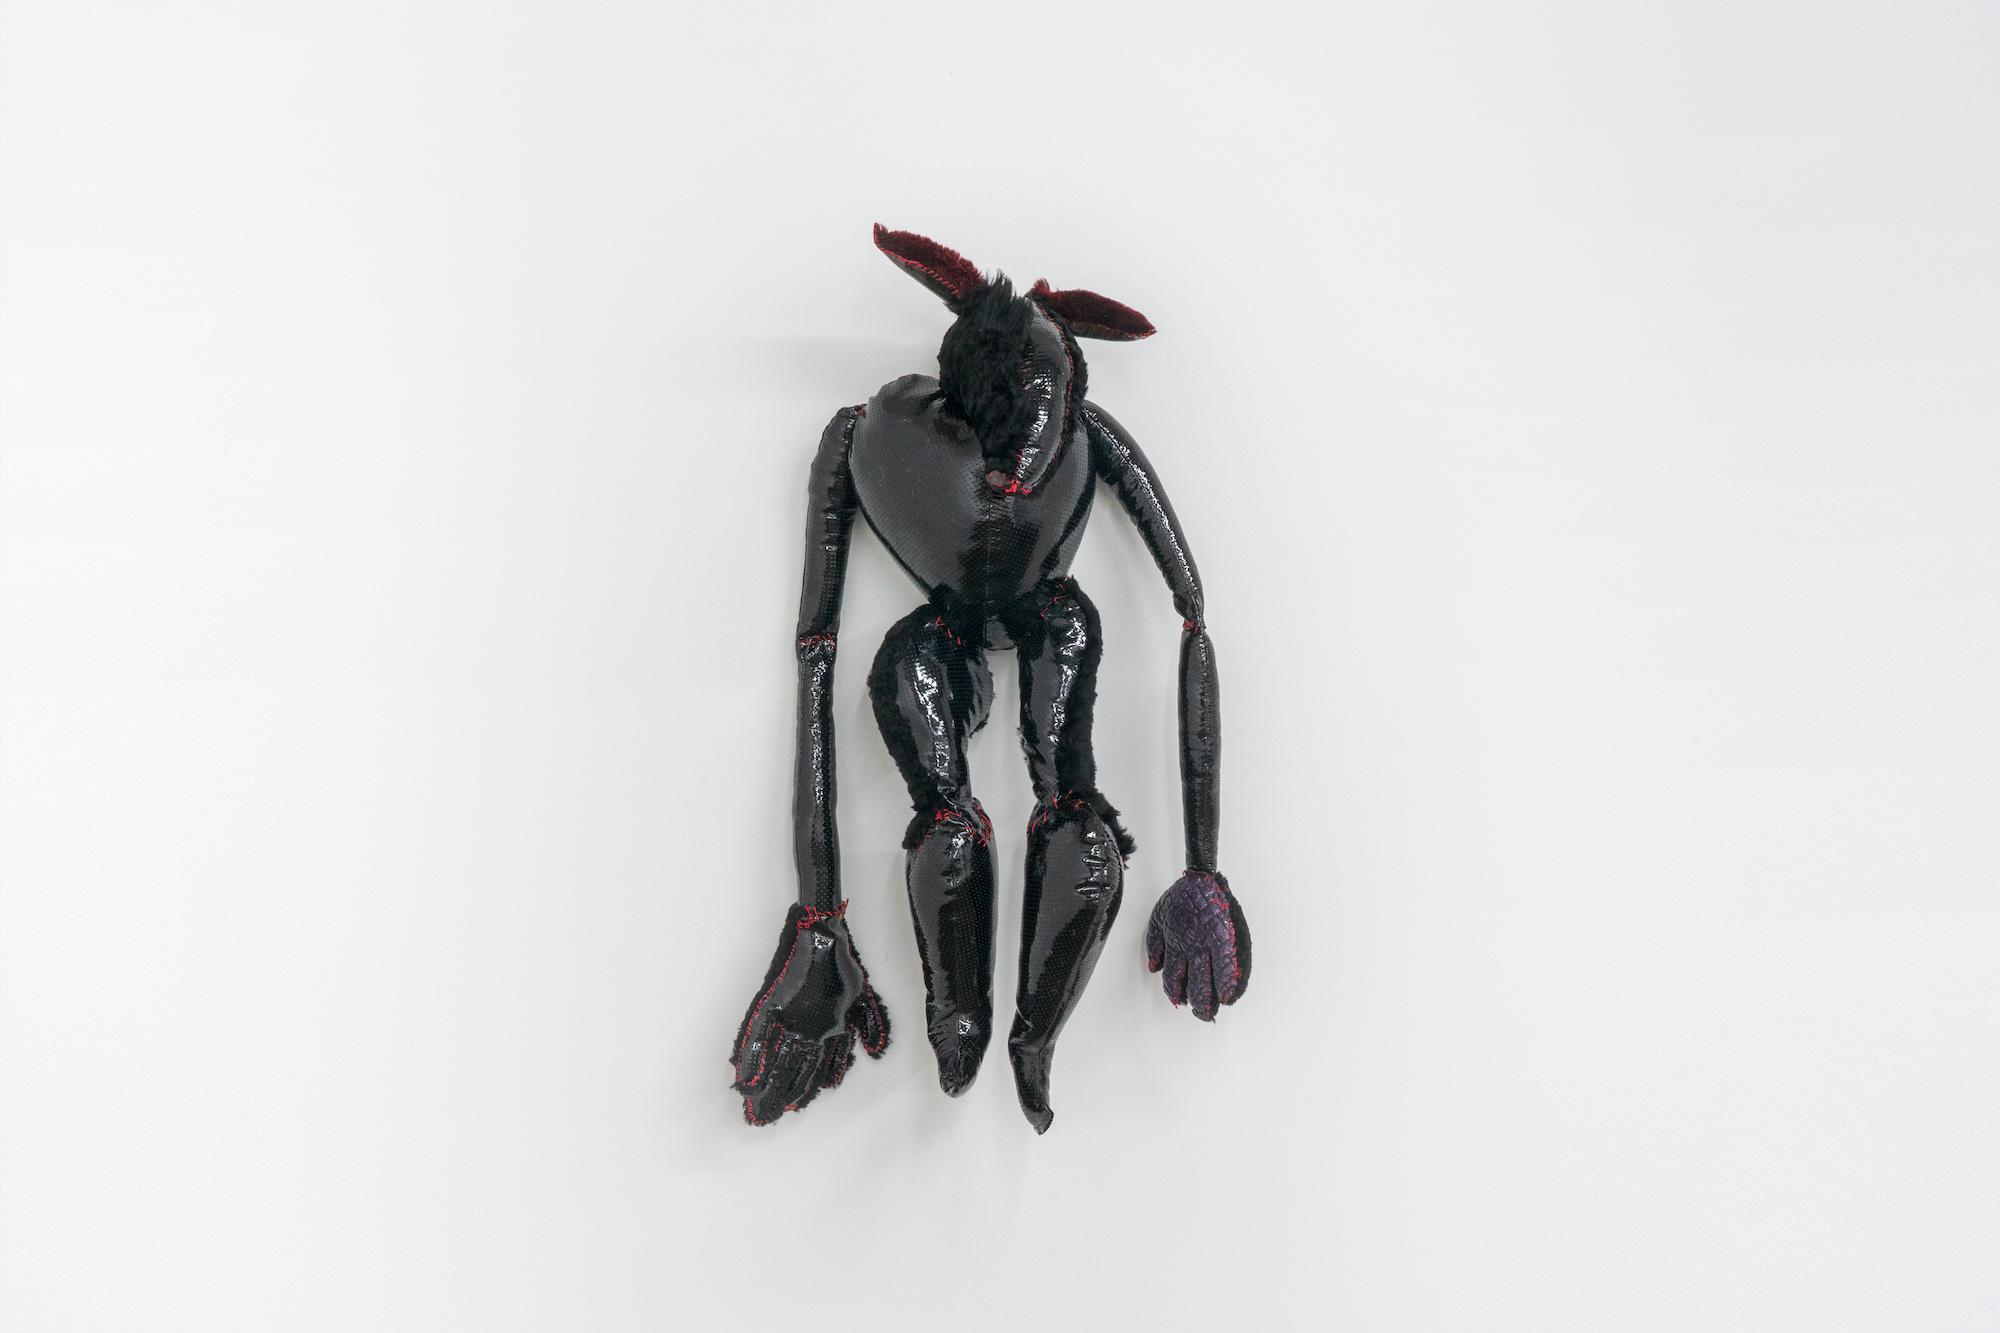 Gray Wielebinski, Minnie, 2018, courtesy of the artist and PUBLIC Gallery